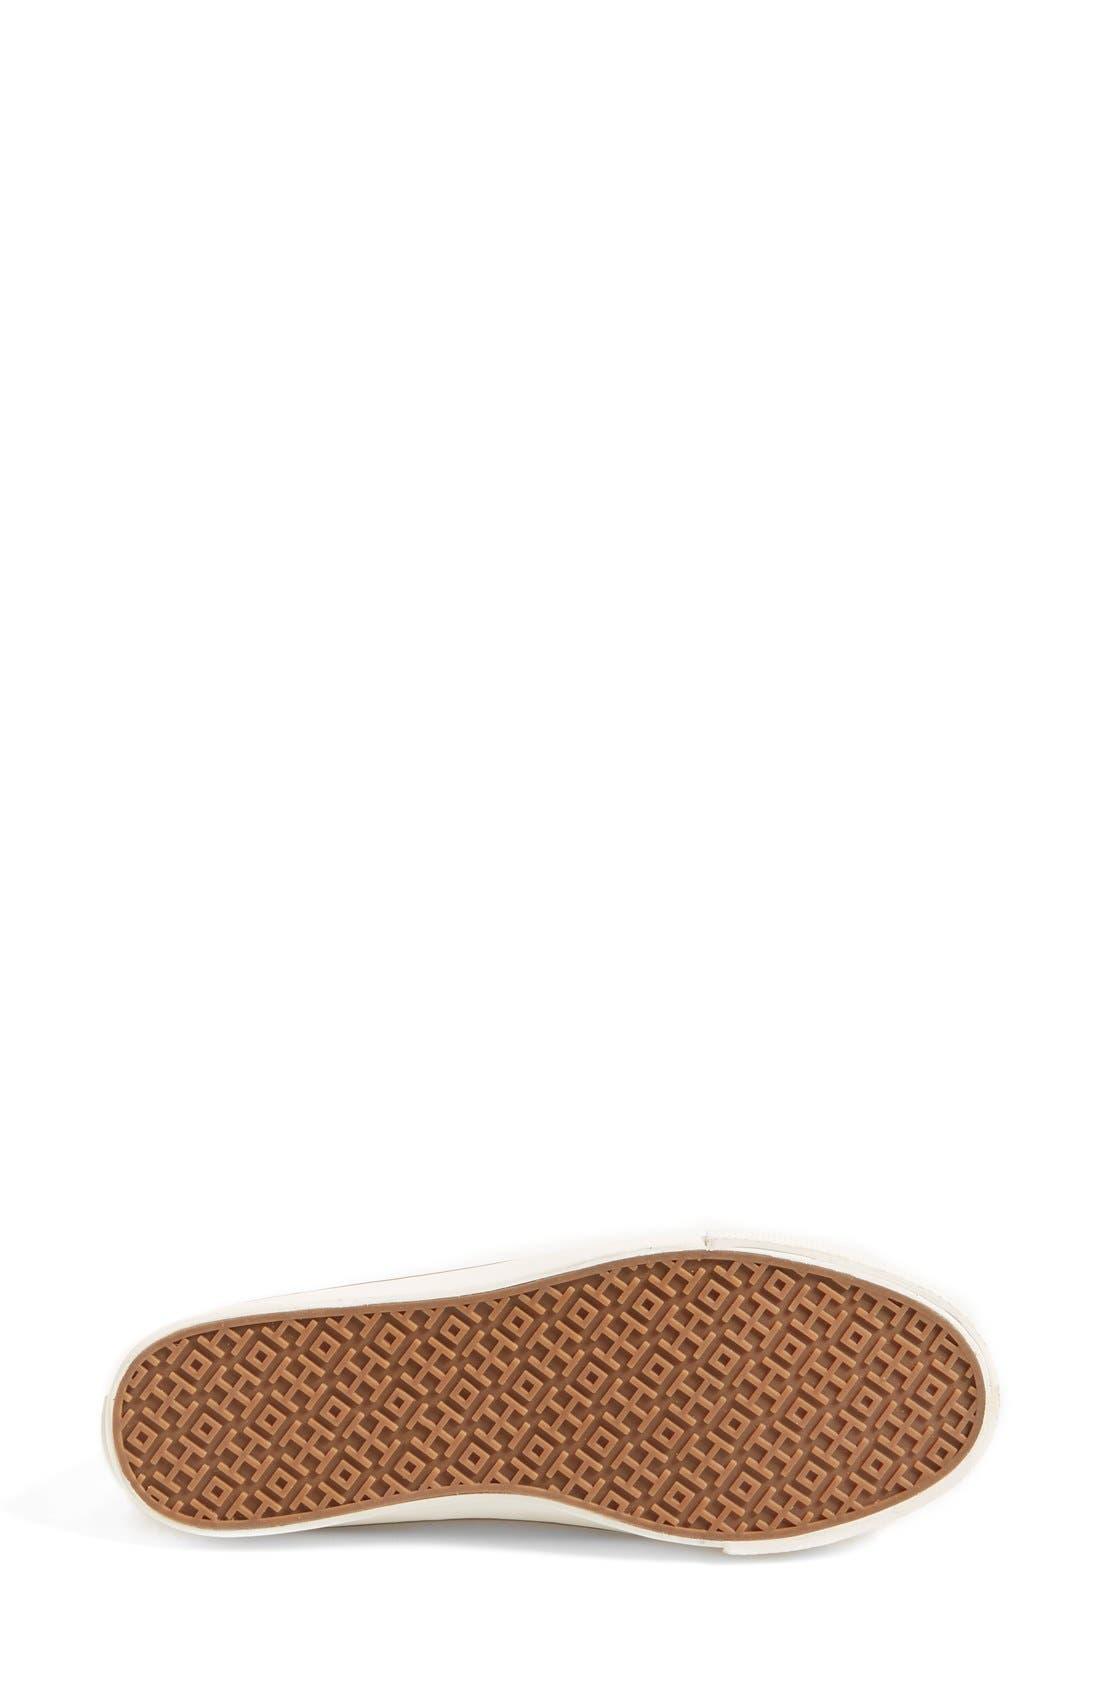 Alternate Image 4  - Tory Burch 'Daisy' Perforated Sneaker (Women)